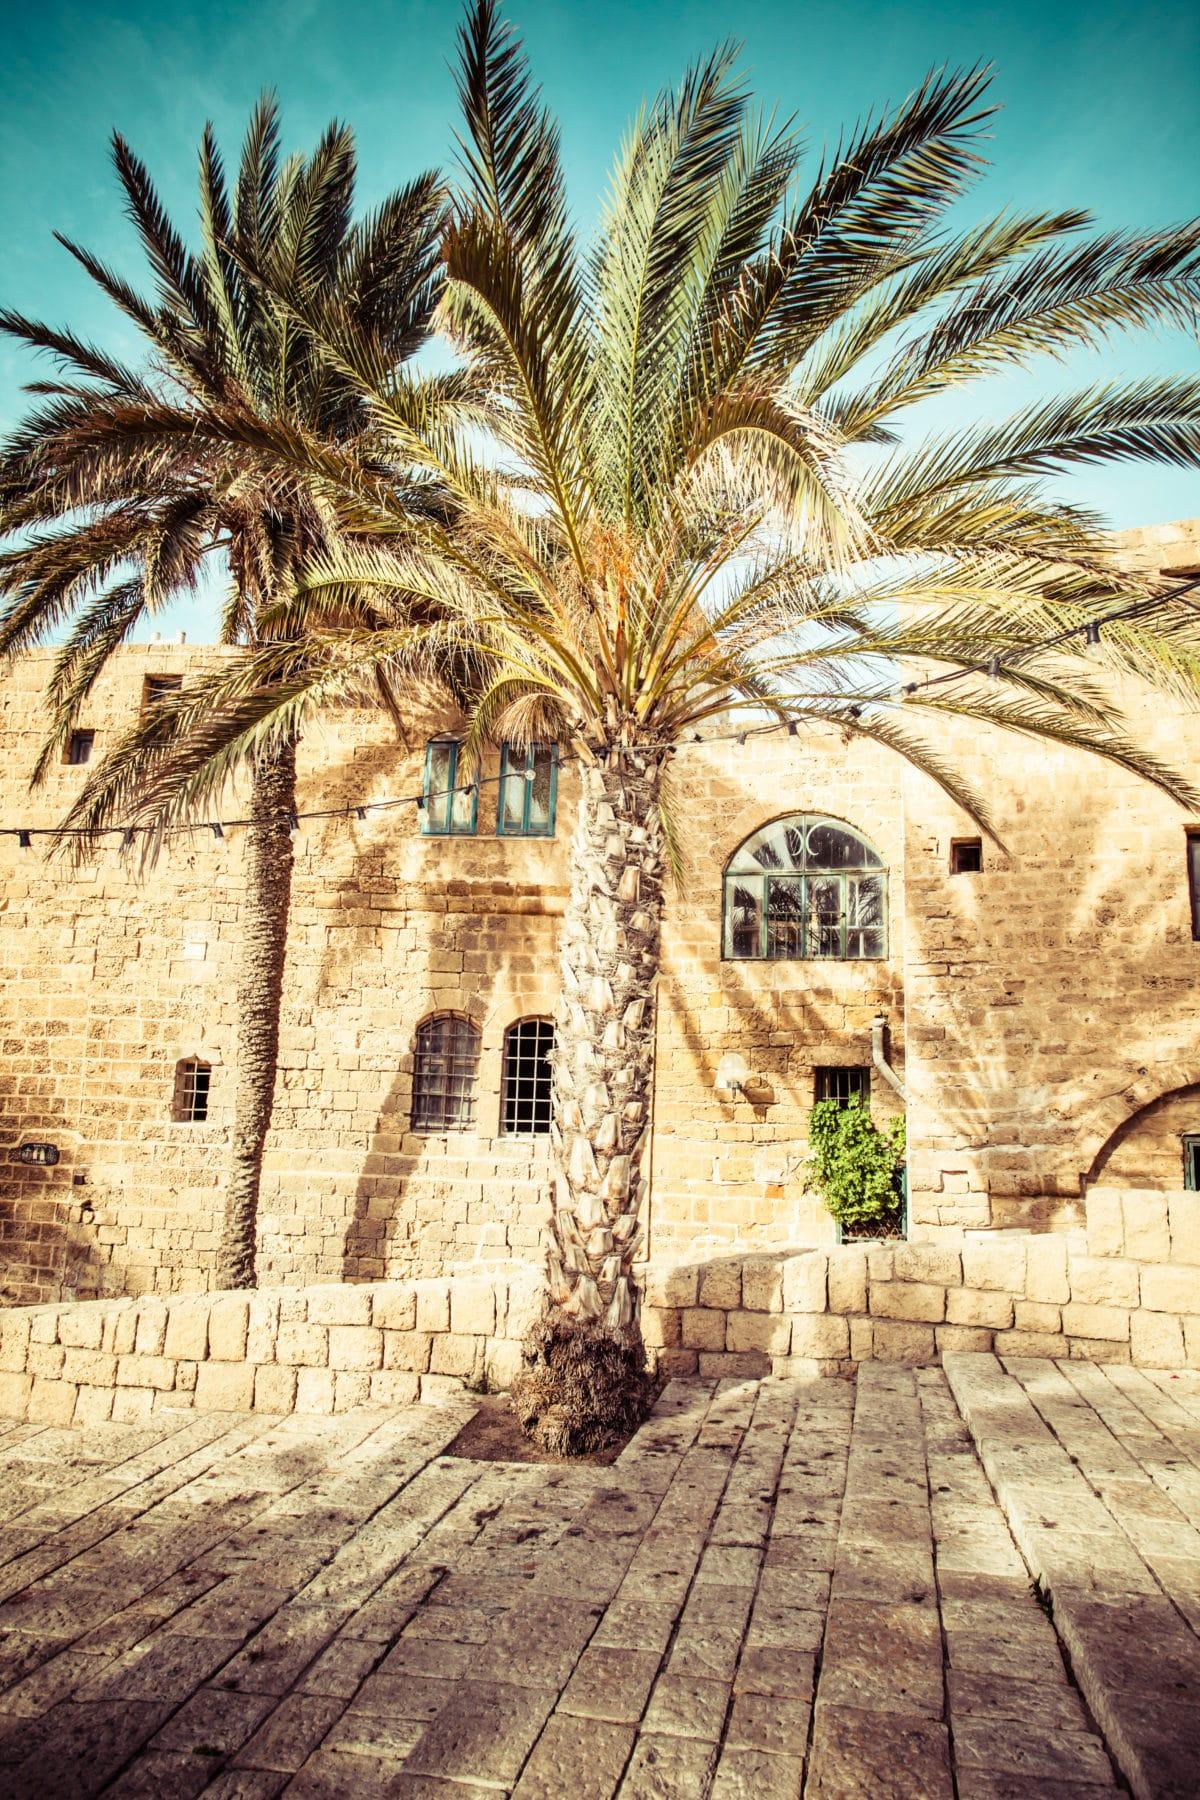 Israel-kontrasternes-land-felecool - AdobeStock_58989543.jpeg